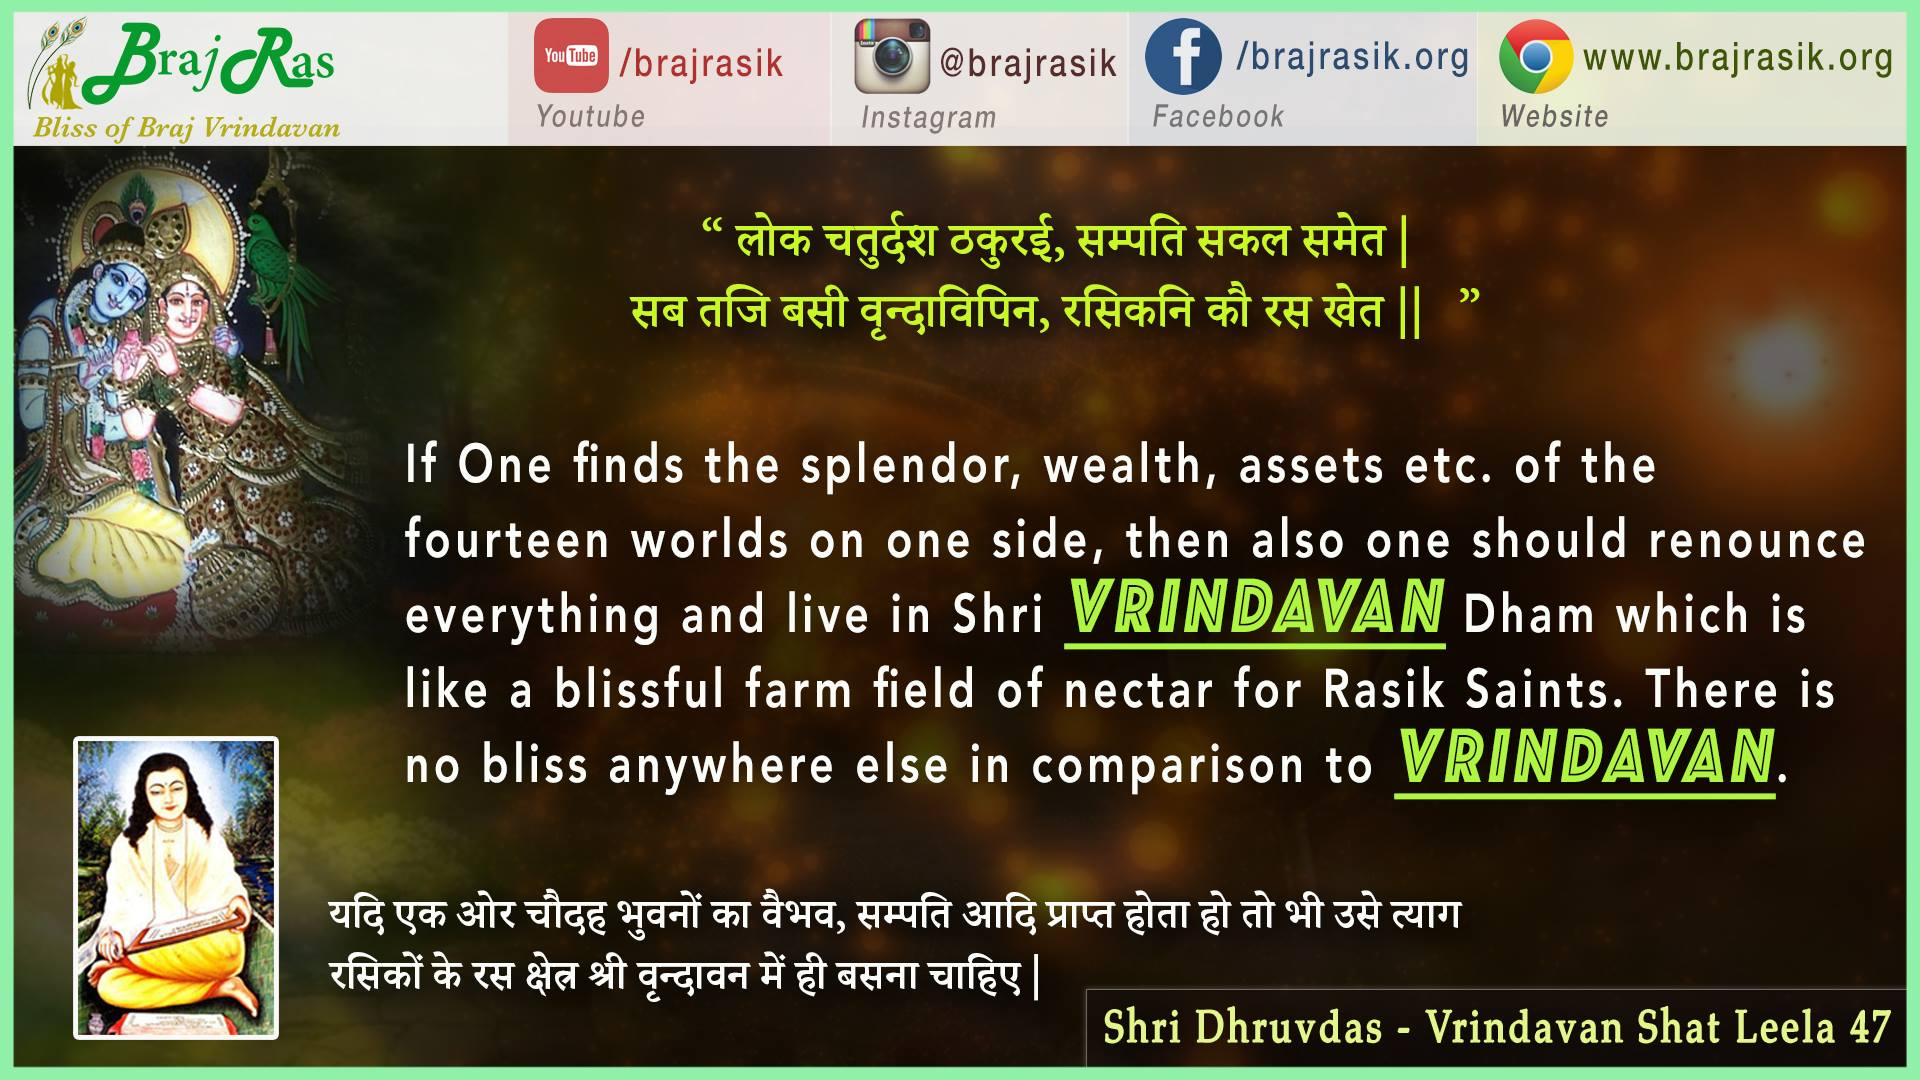 Lok Charudash Thakurai - Shri Dhruvdas - Vrindavan Shat Leela (47)